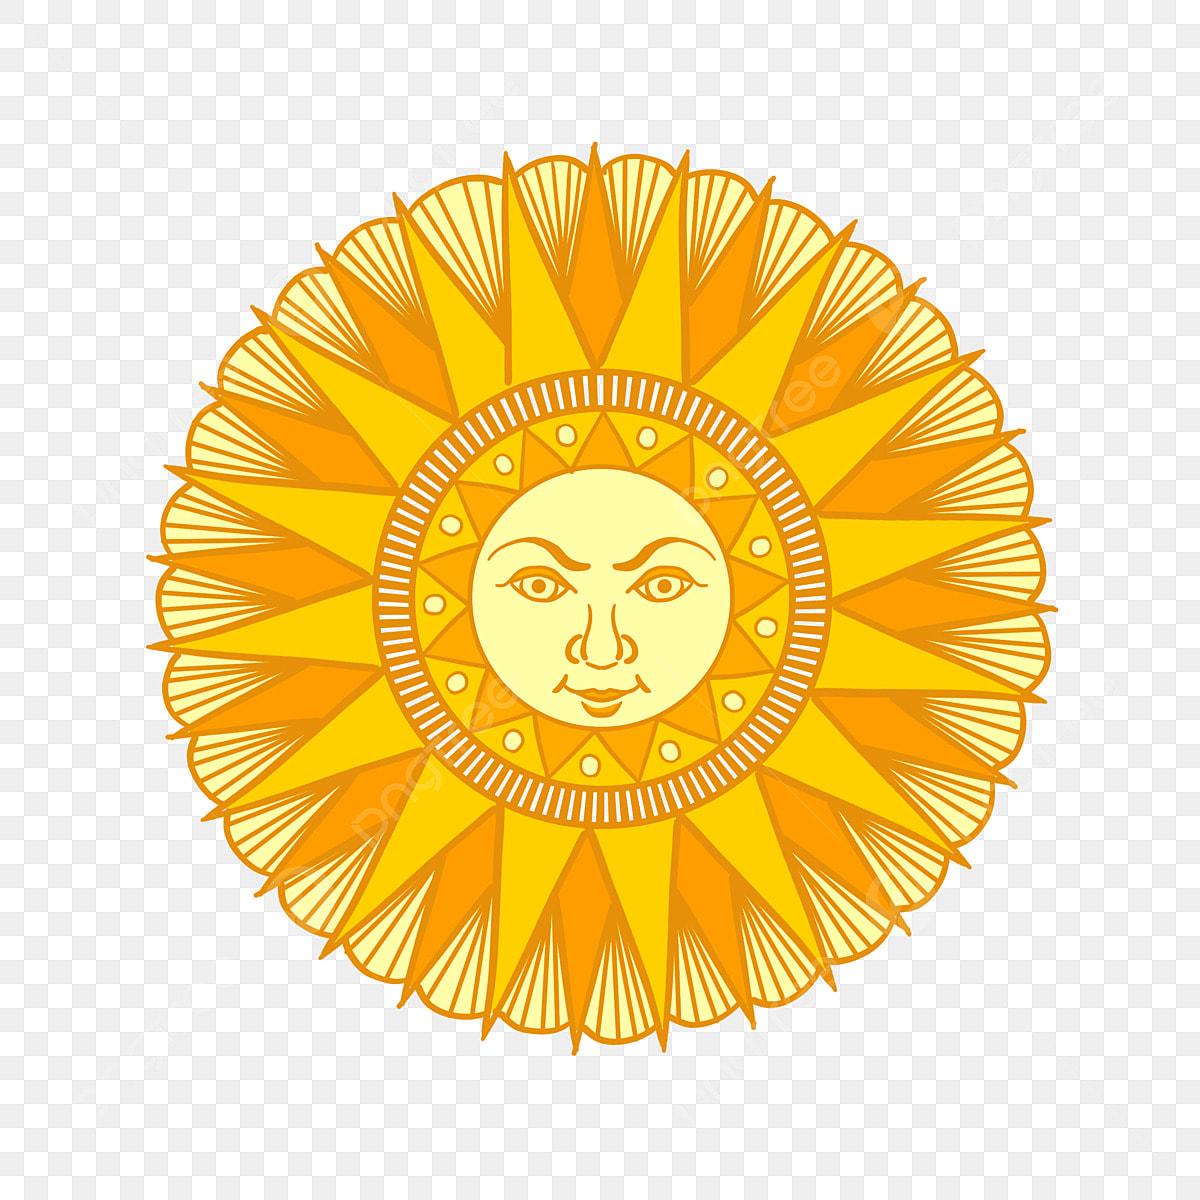 Sun Clip Art of Shining